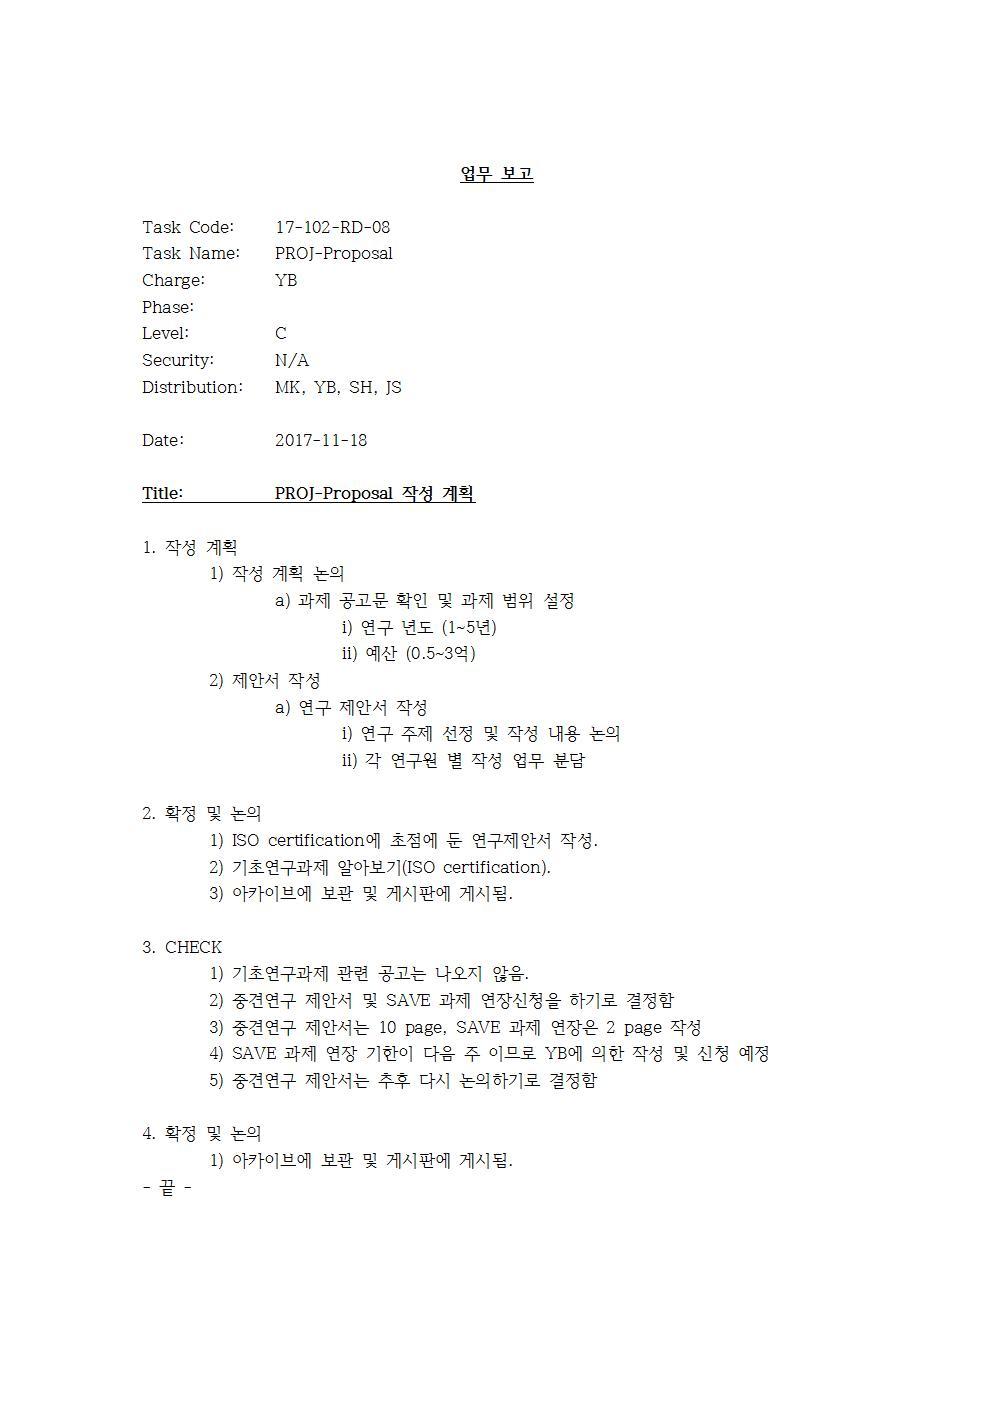 D-[17-102-RD-08]-[PROJ-Proposal]-[YB]-[2017-11-18]001.jpg